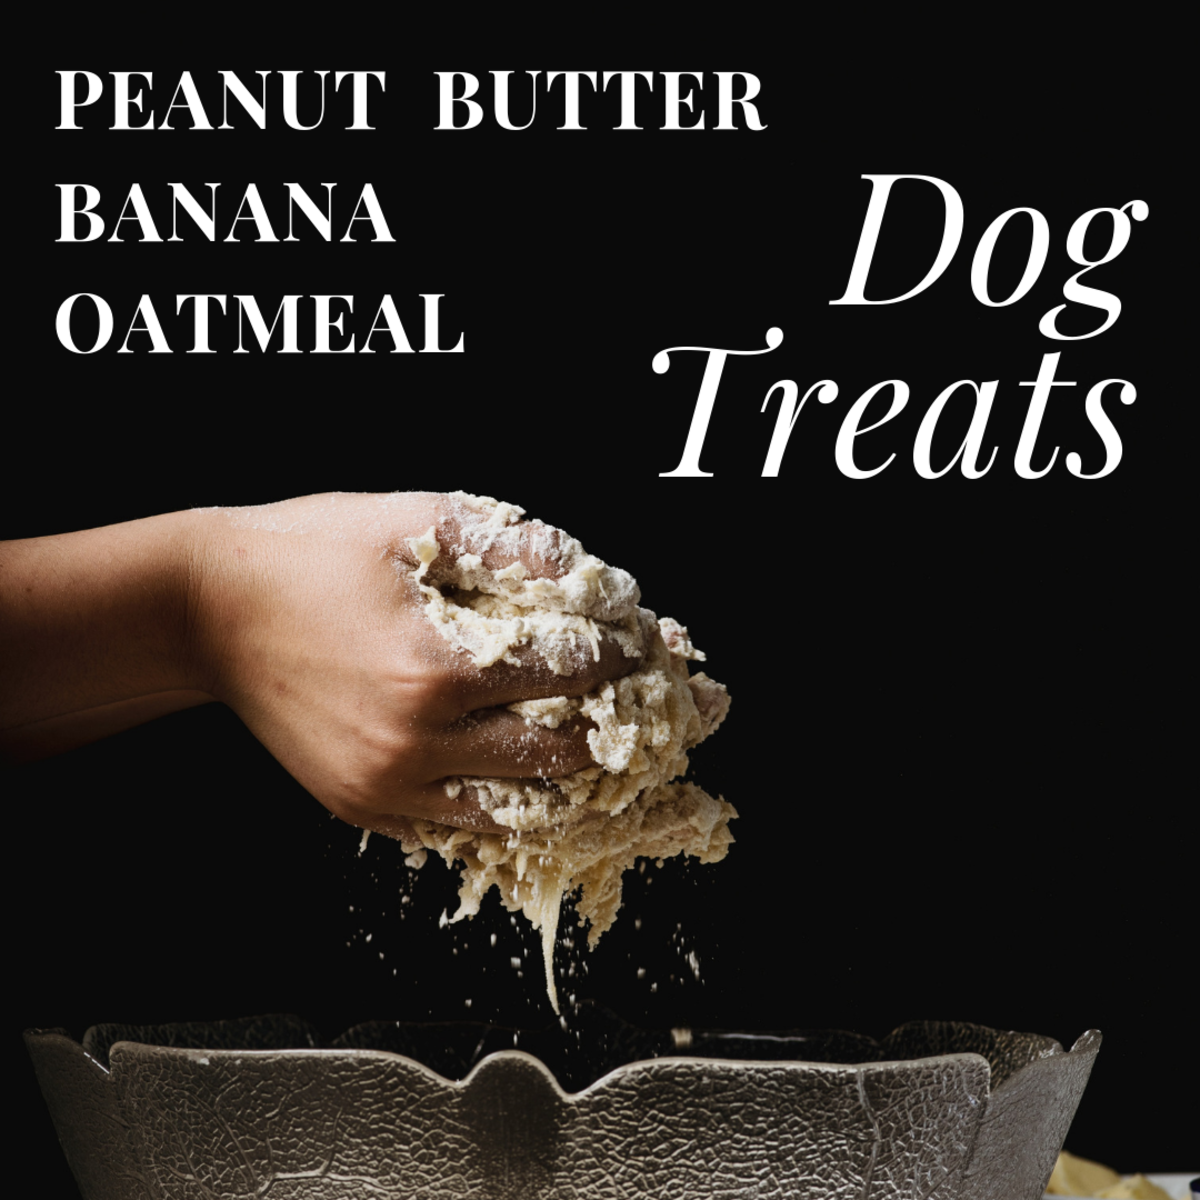 Homemade Dog Treats: Peanut Butter, Banana, and Oatmeal